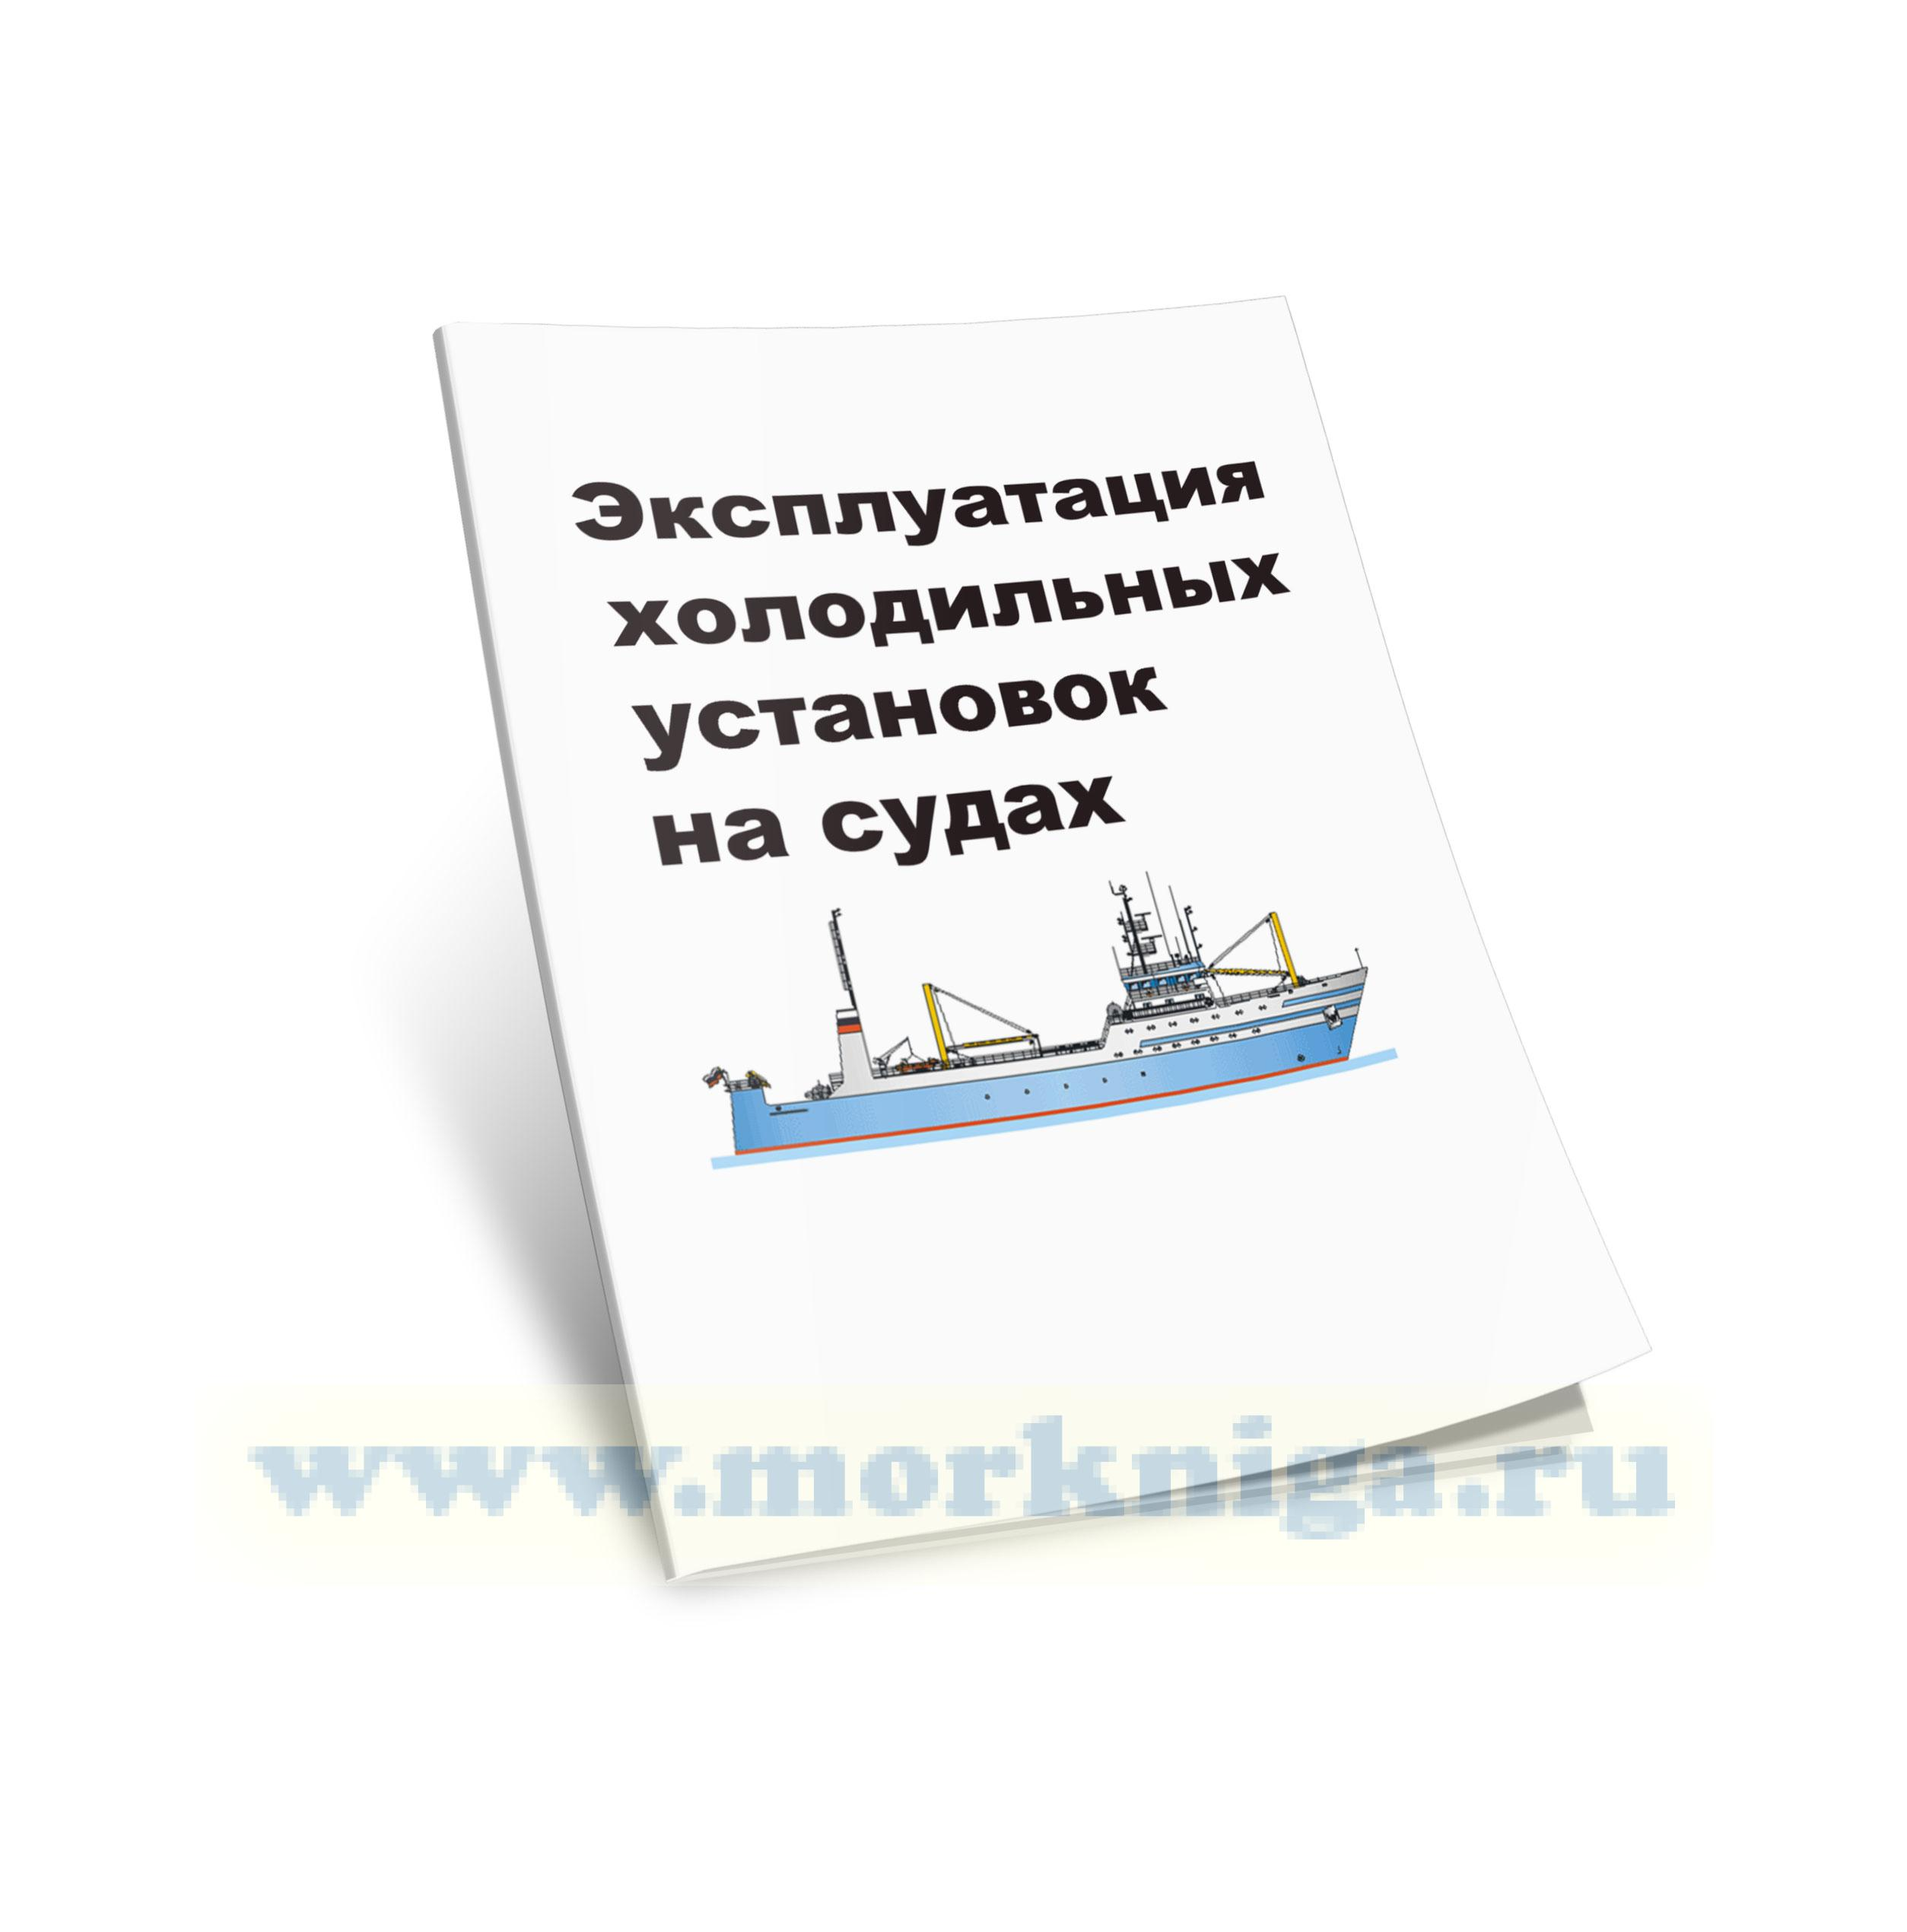 Эксплуатация холодильных установок на судах (автоматика)